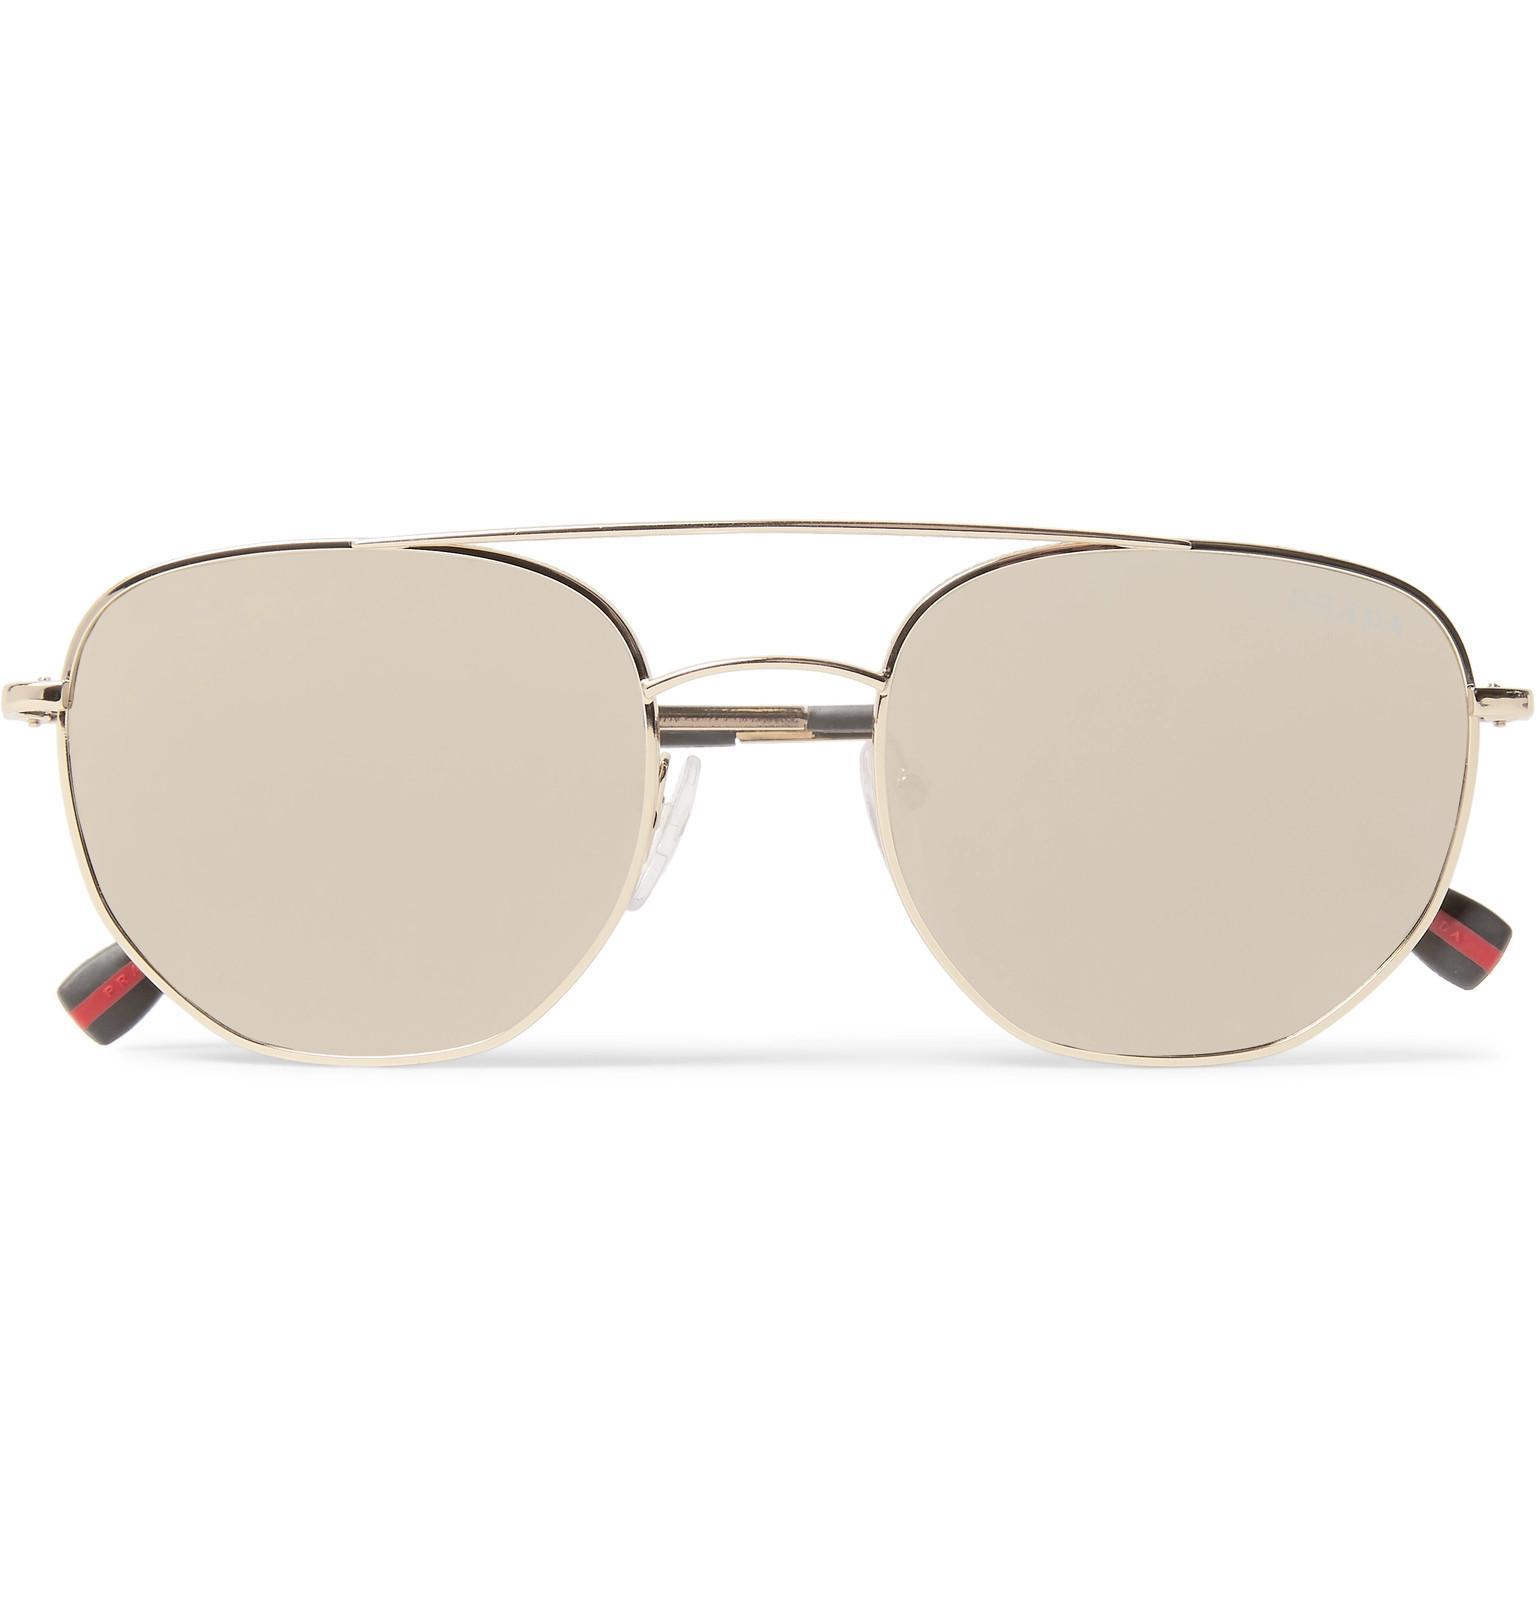 aceb5bee76 ... spain lyst prada aviator style gold tone mirrored sunglasses in  metallic bc444 930ca